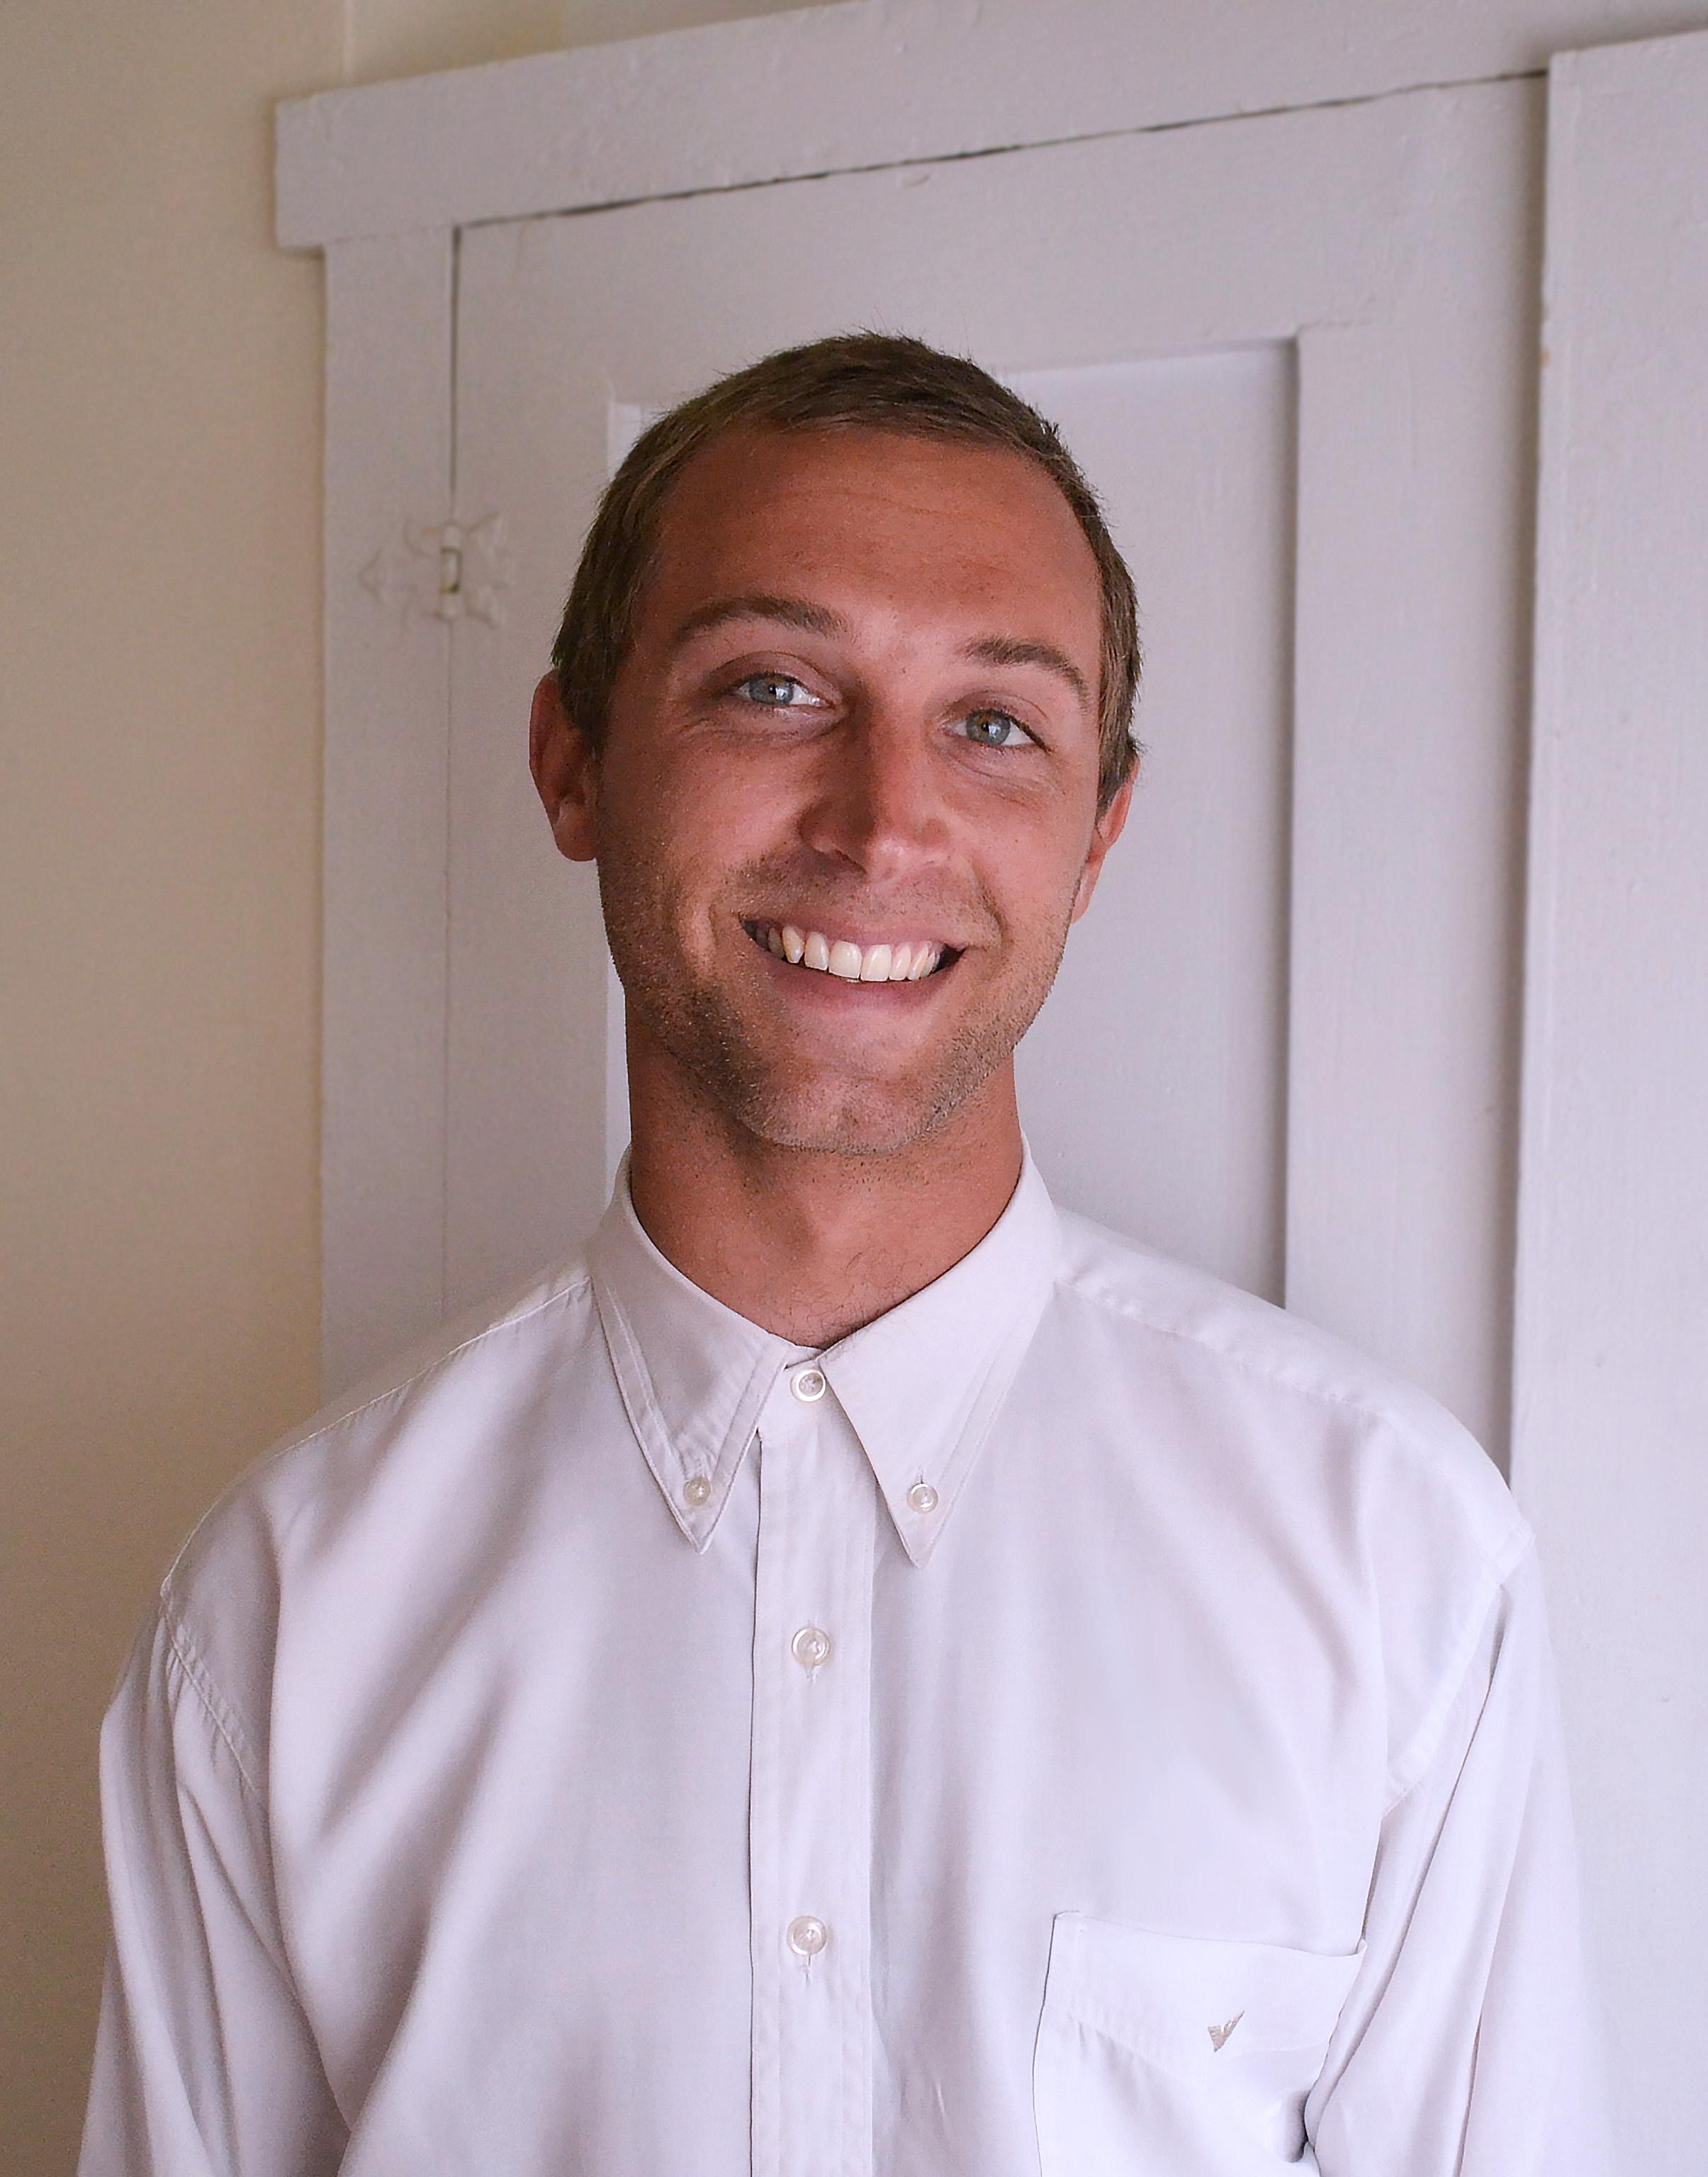 Robert Wrightson, B.S., ACT, SAT, Math and Biology instructor